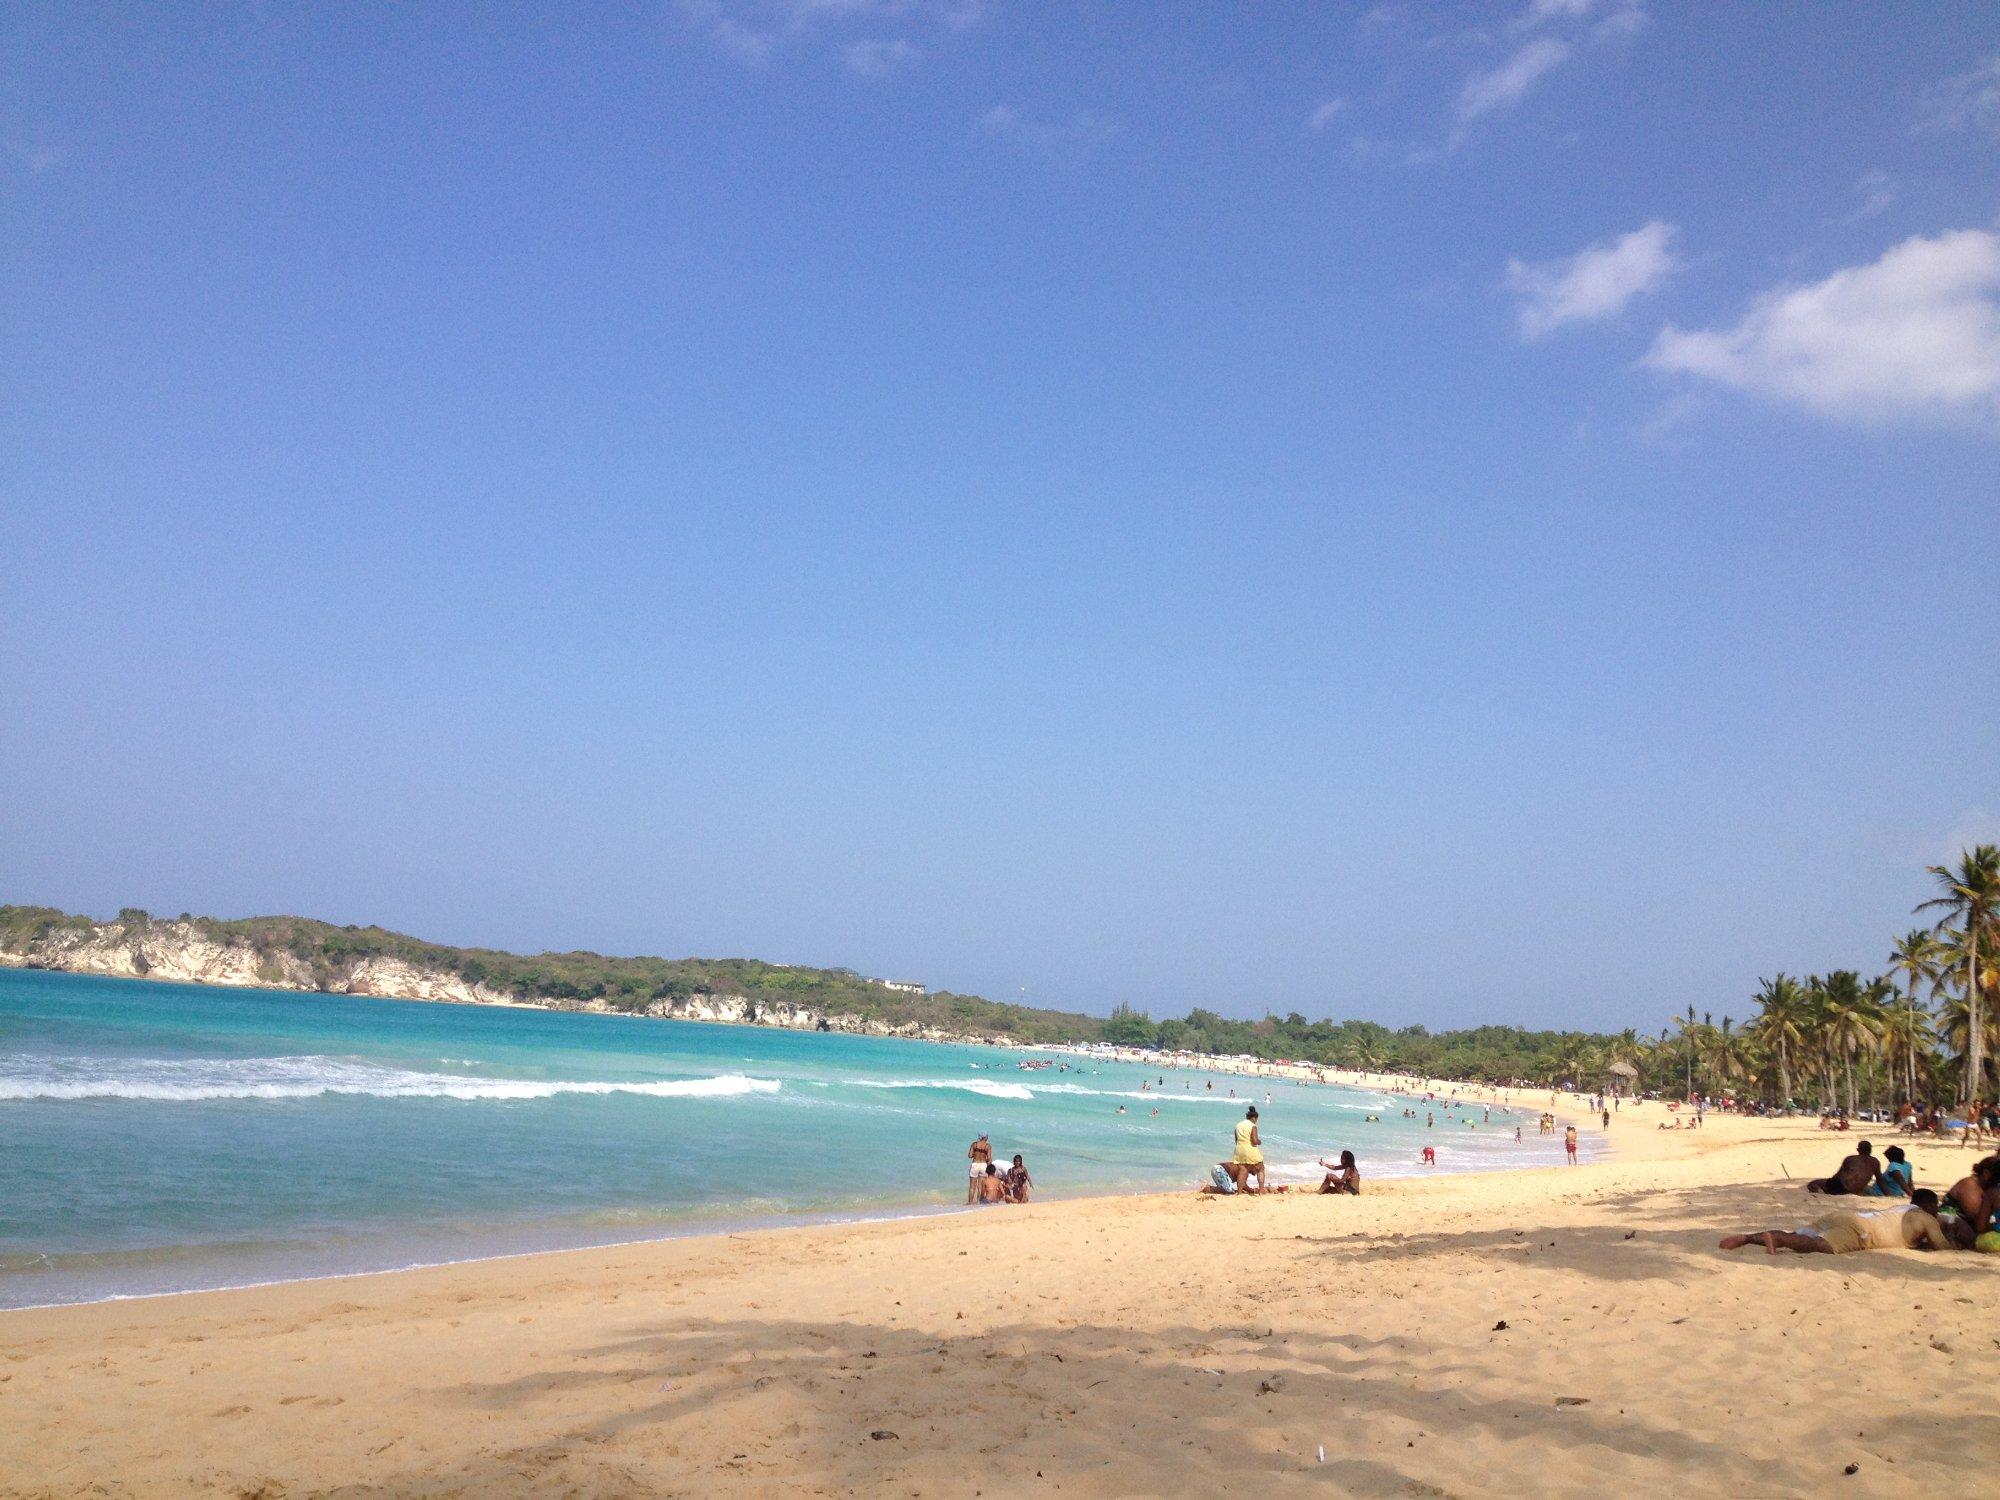 Macao Beach